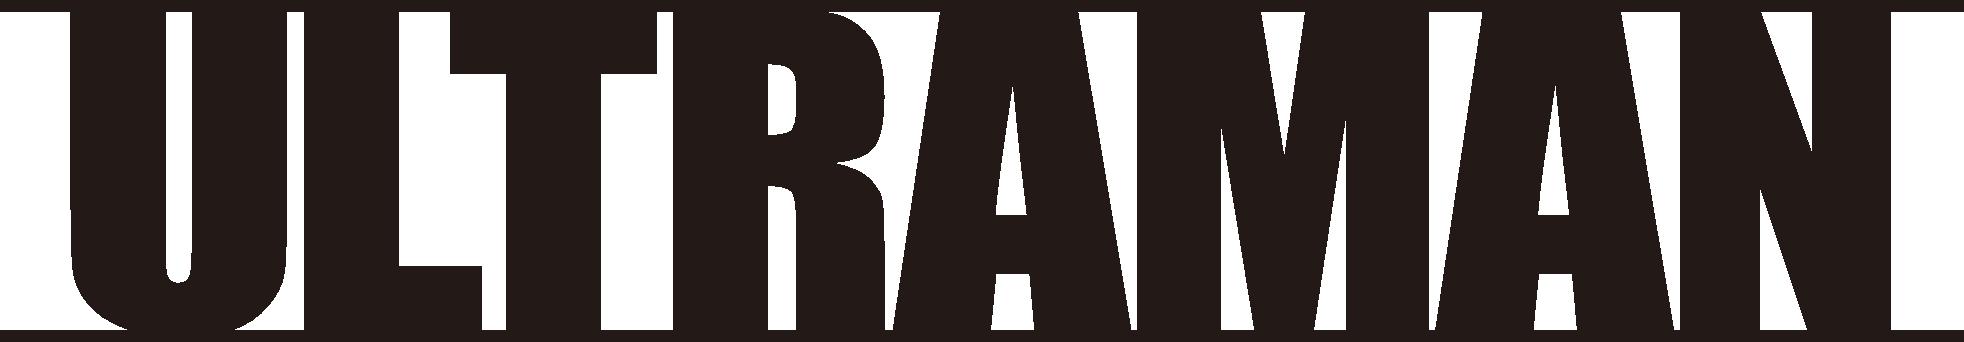 ultraman_comics_logo_underline.png